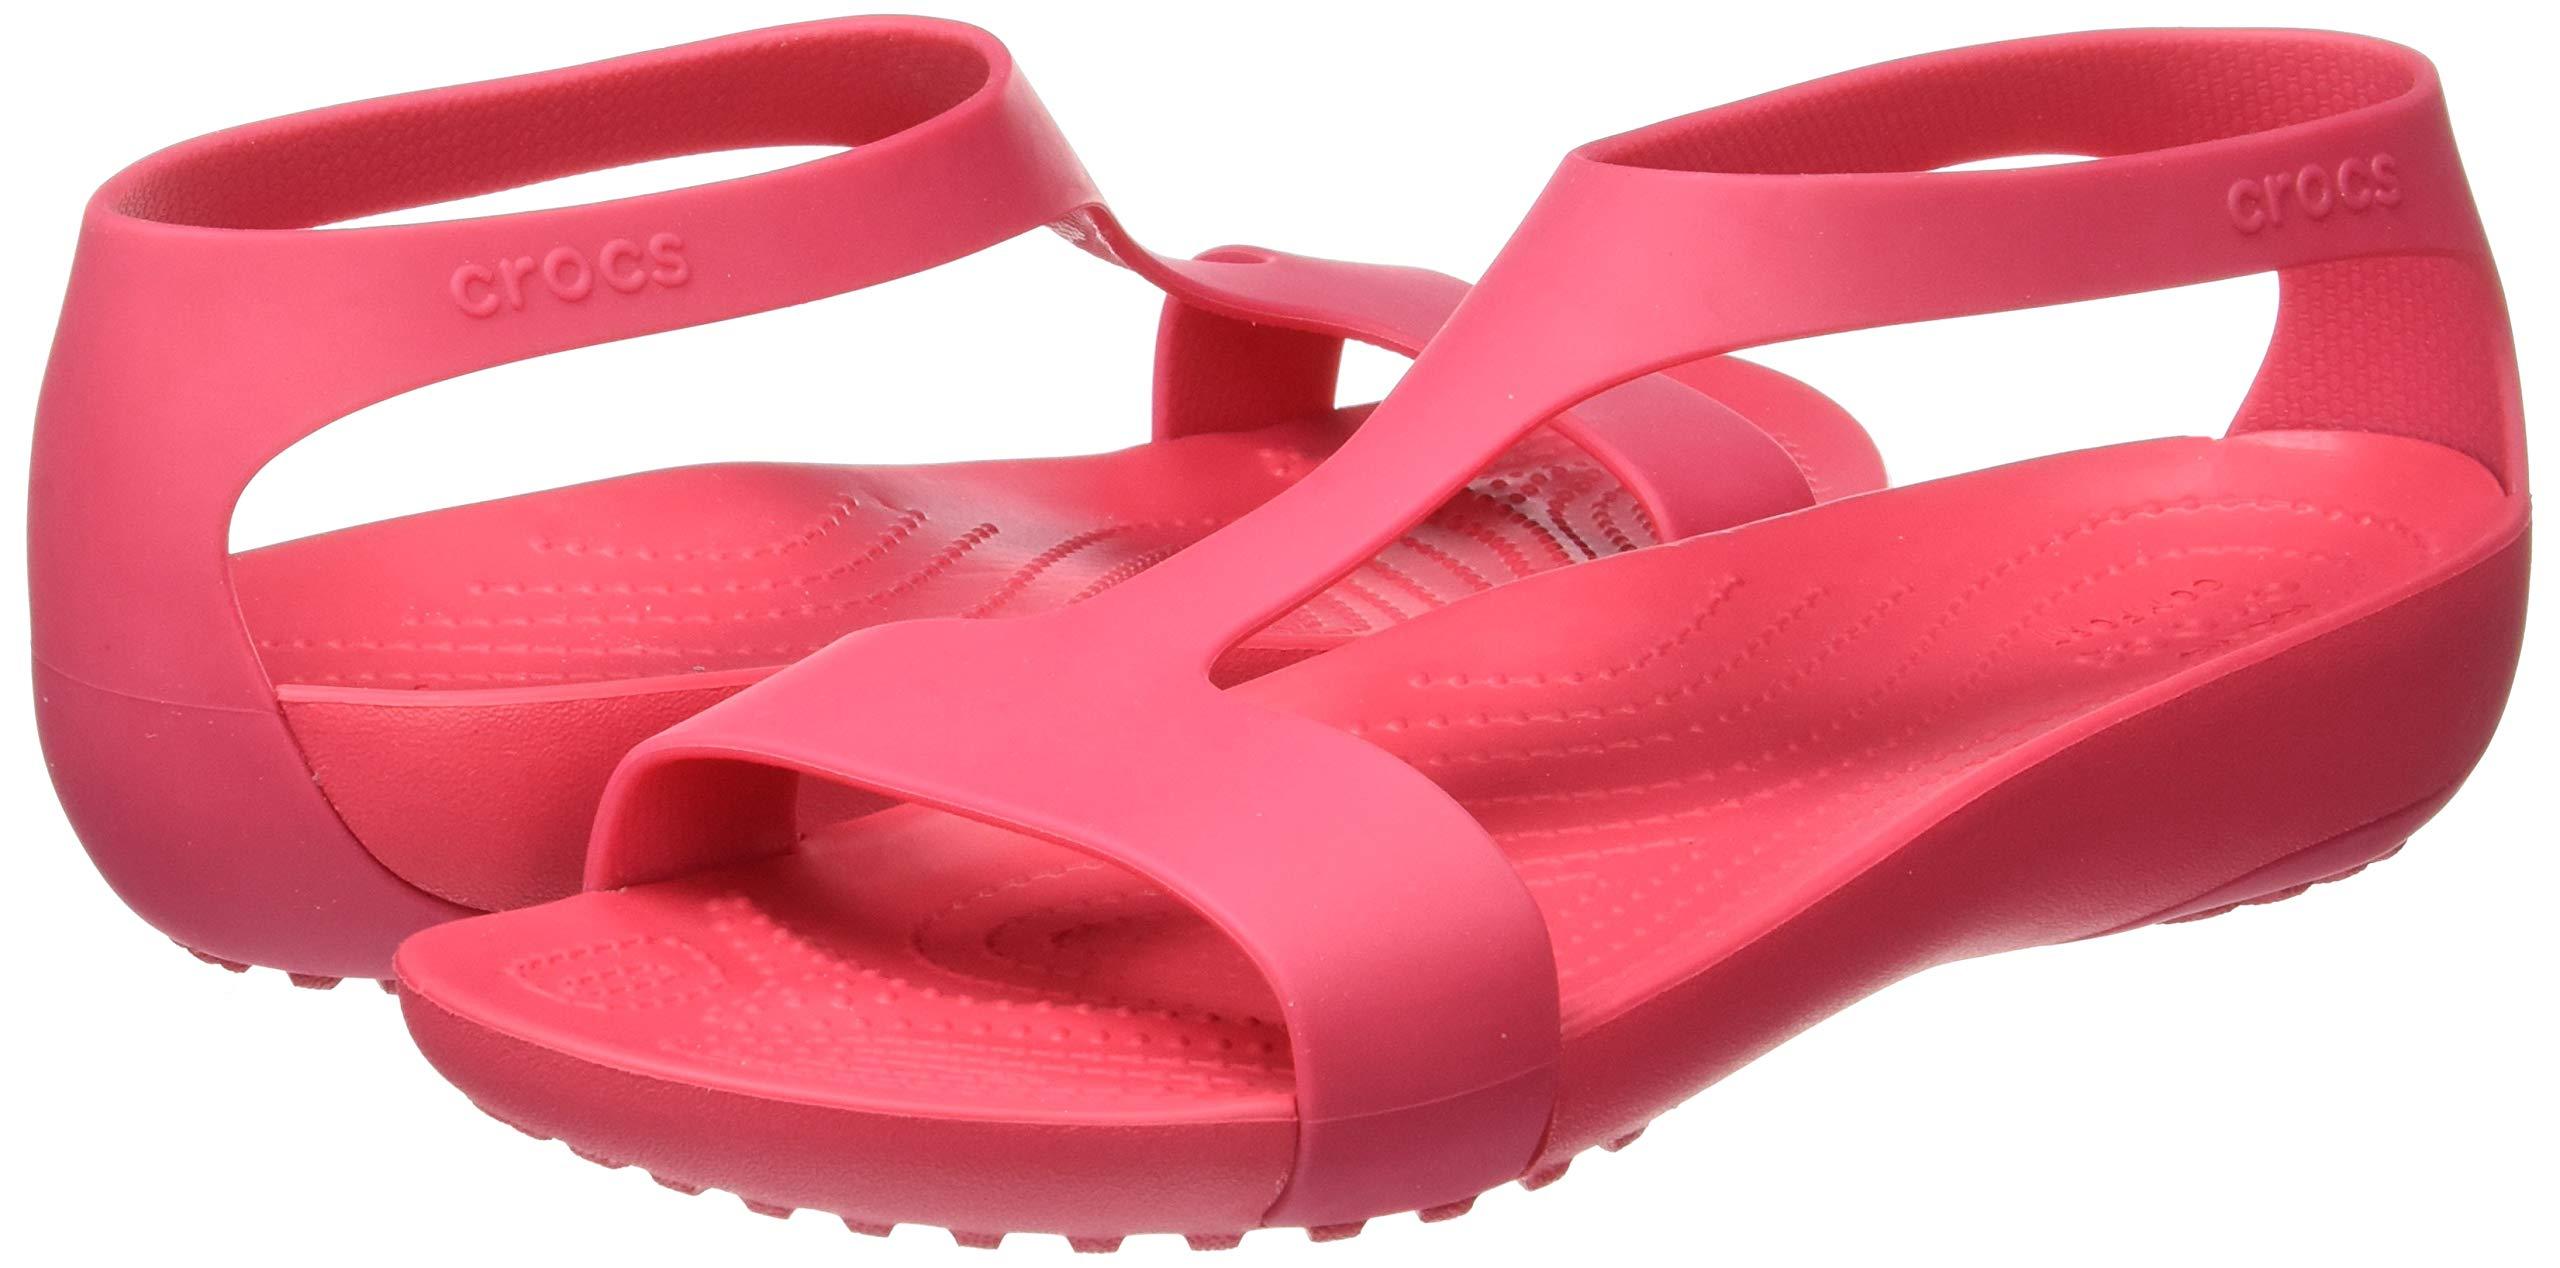 Crocs Women's Serena Flat Sandal